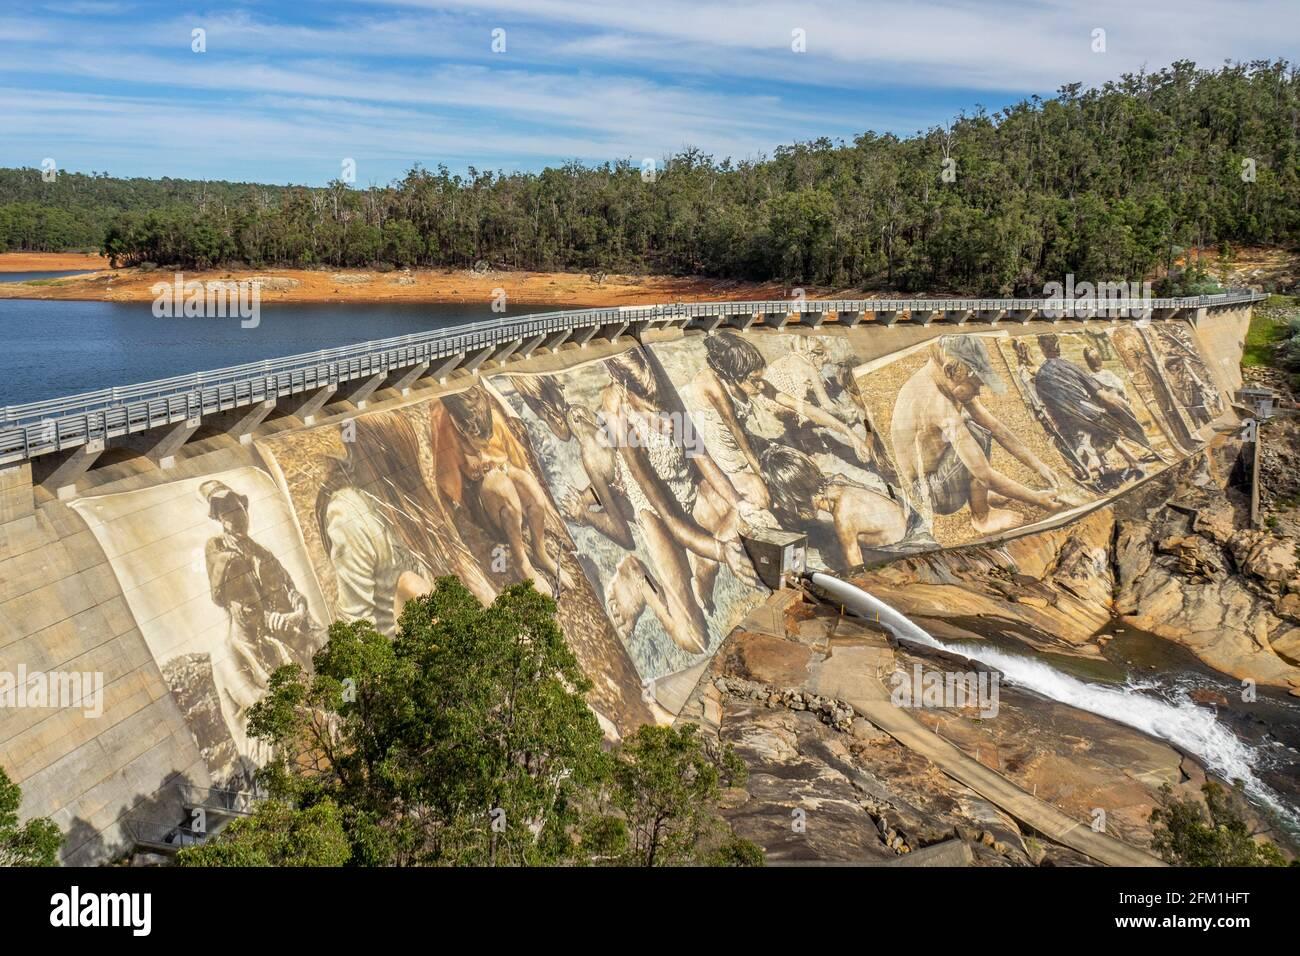 wellington-dam-worlds-largest-dam-wall-mural-painted-by-guido-van-helten-artist-collie-western-australia-2FM1HFT.jpg